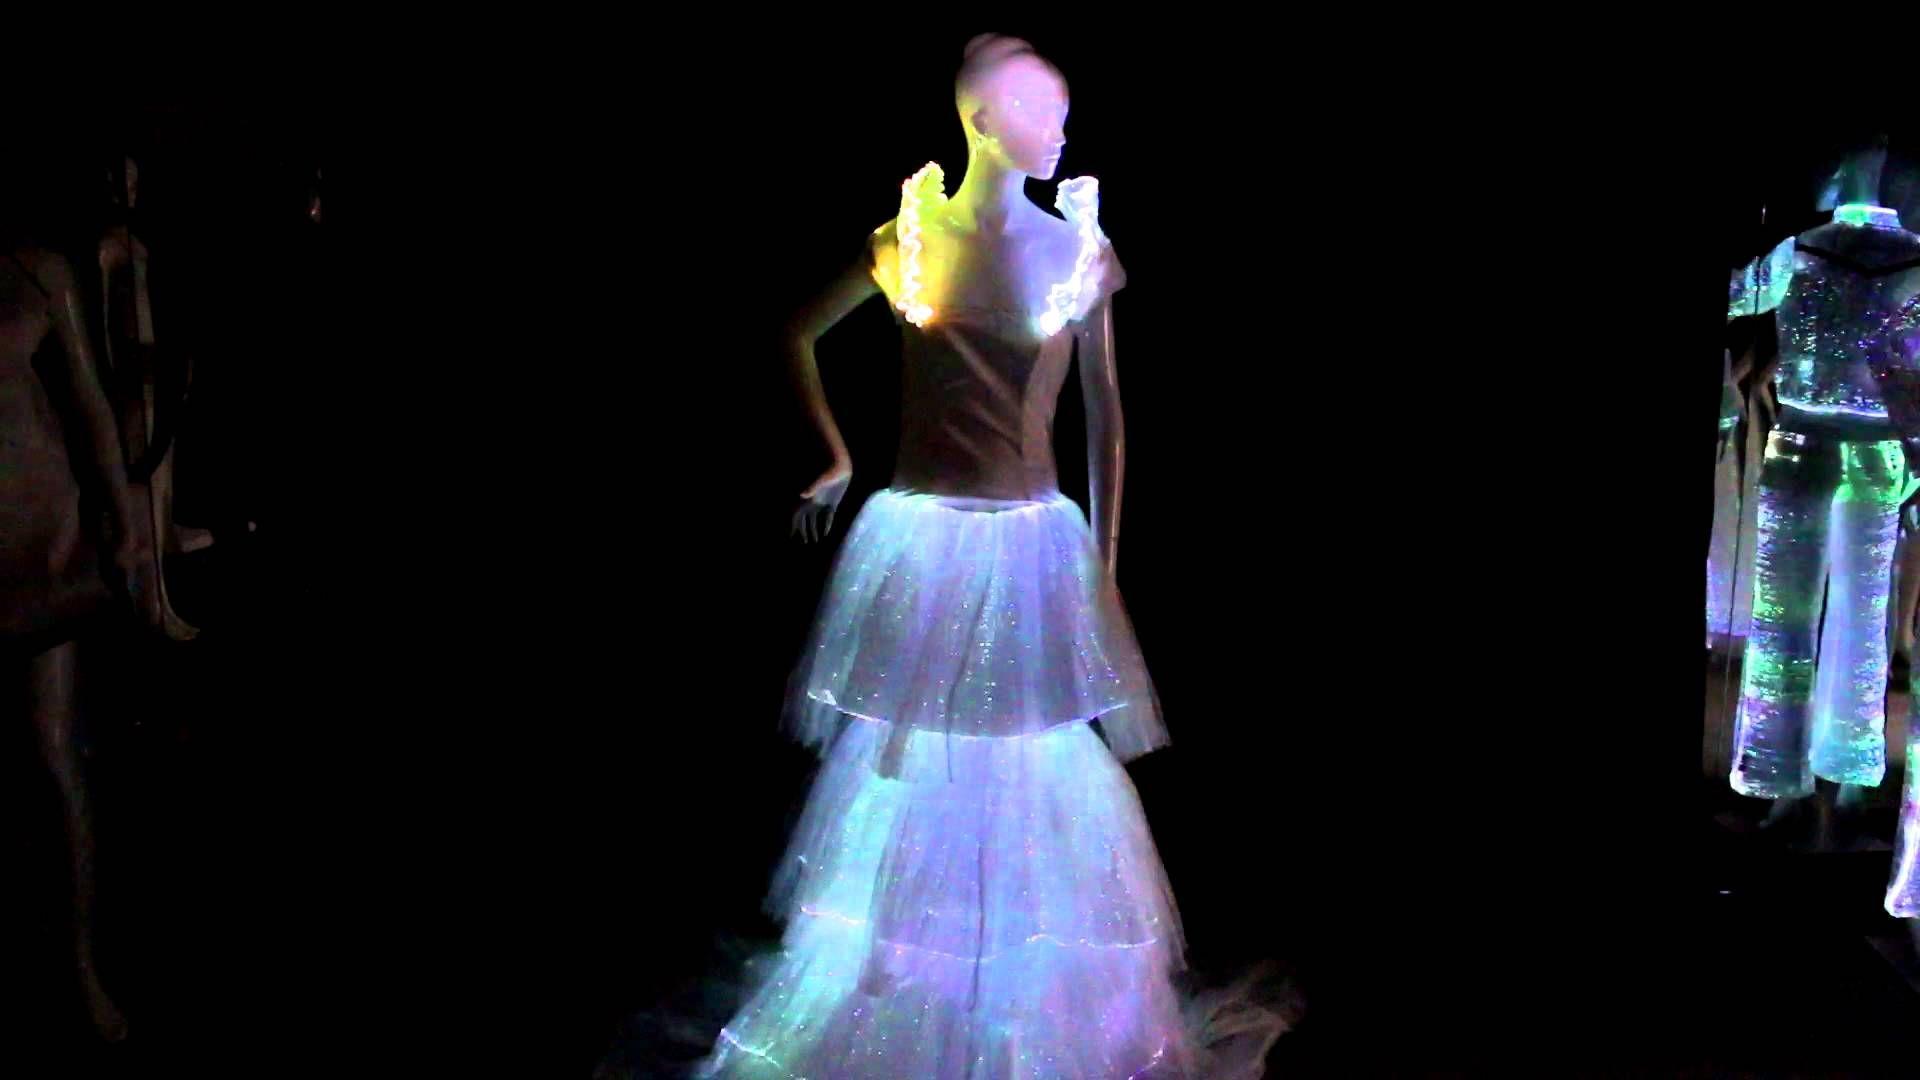 Fiber optic wedding dress  fiber optic fabric luminous bridal gown  Things to Wear  Pinterest